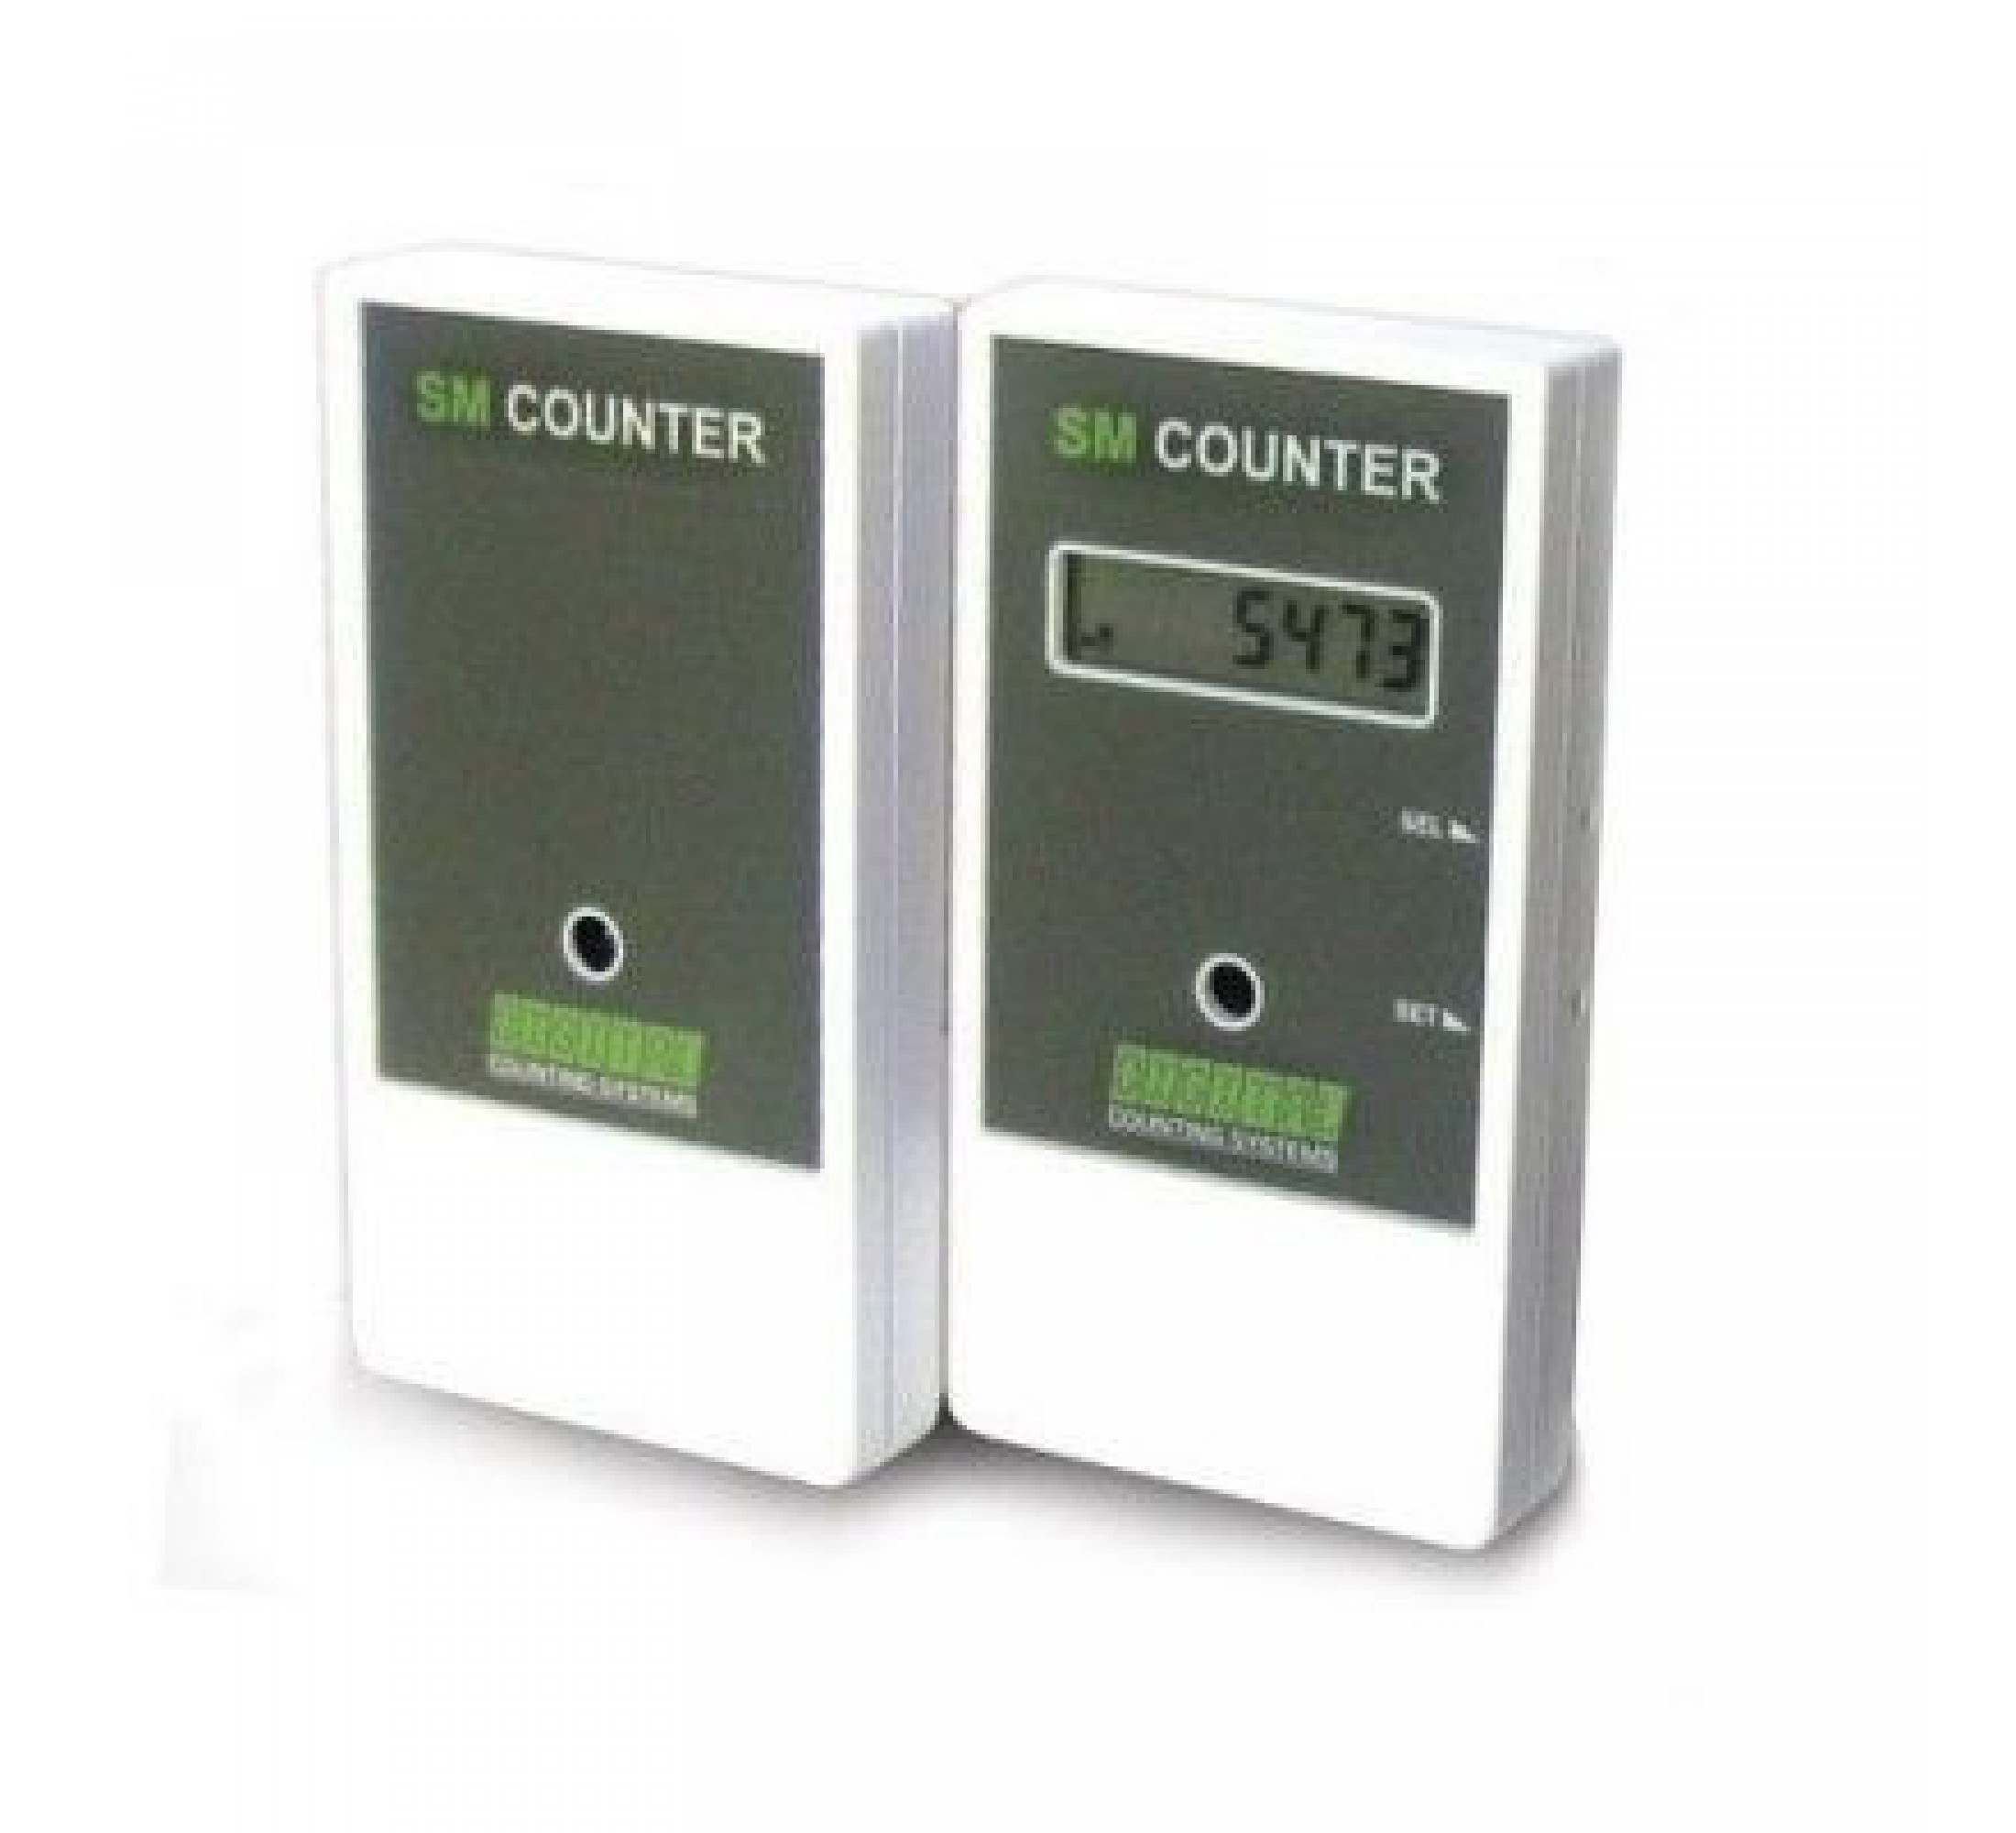 Счетчик посетителей SM Counter